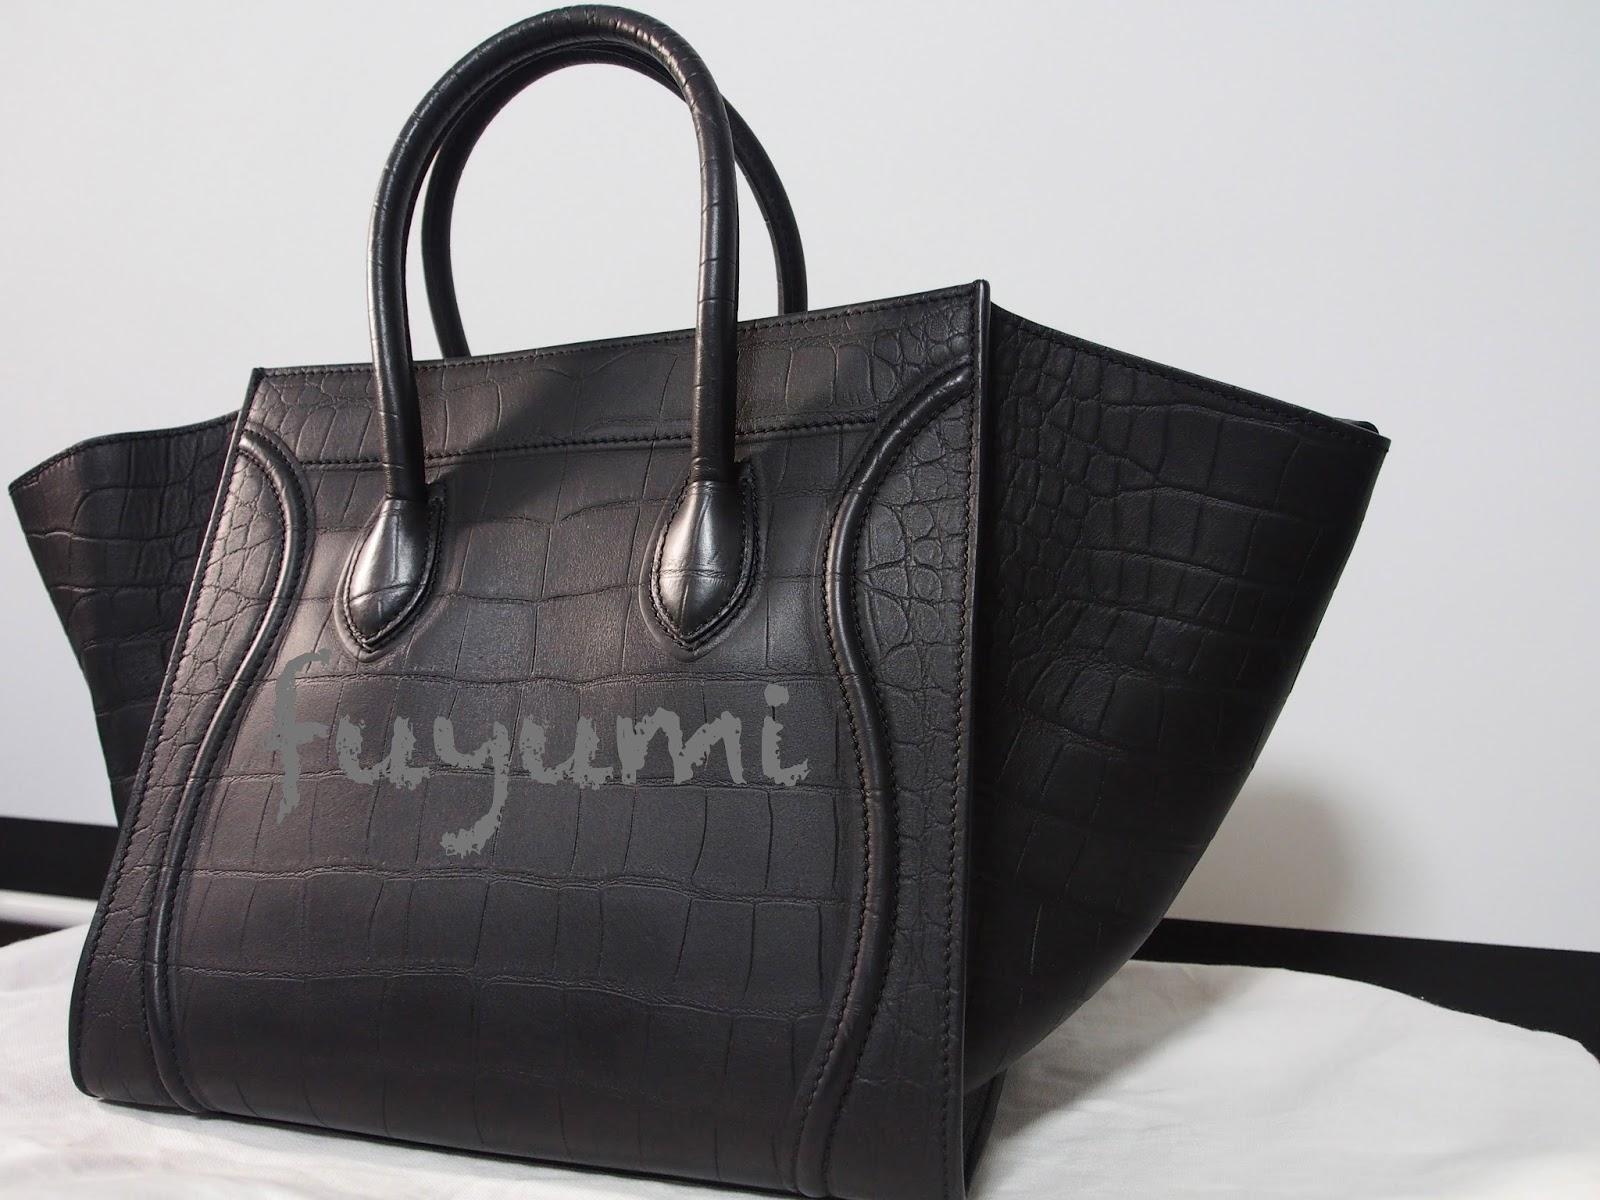 neon pink celine bag - Lyn's Blogalicious: Review : Celine Croc Embossed Phantom